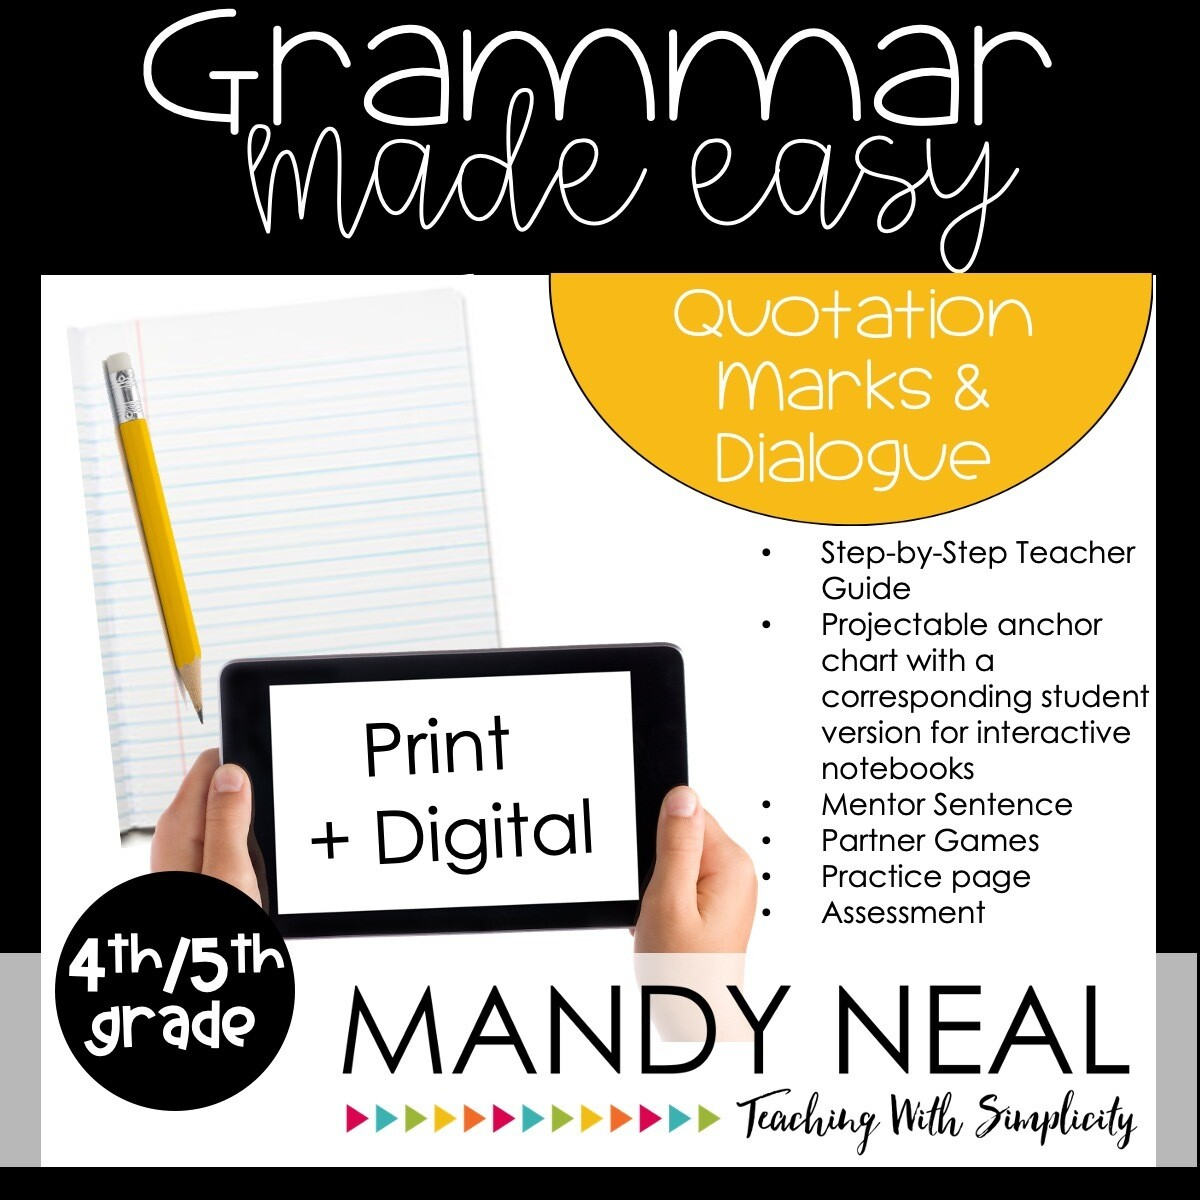 Print + Digital Fourth and Fifth Grade Grammar Activities (Quotation & Dialogue)